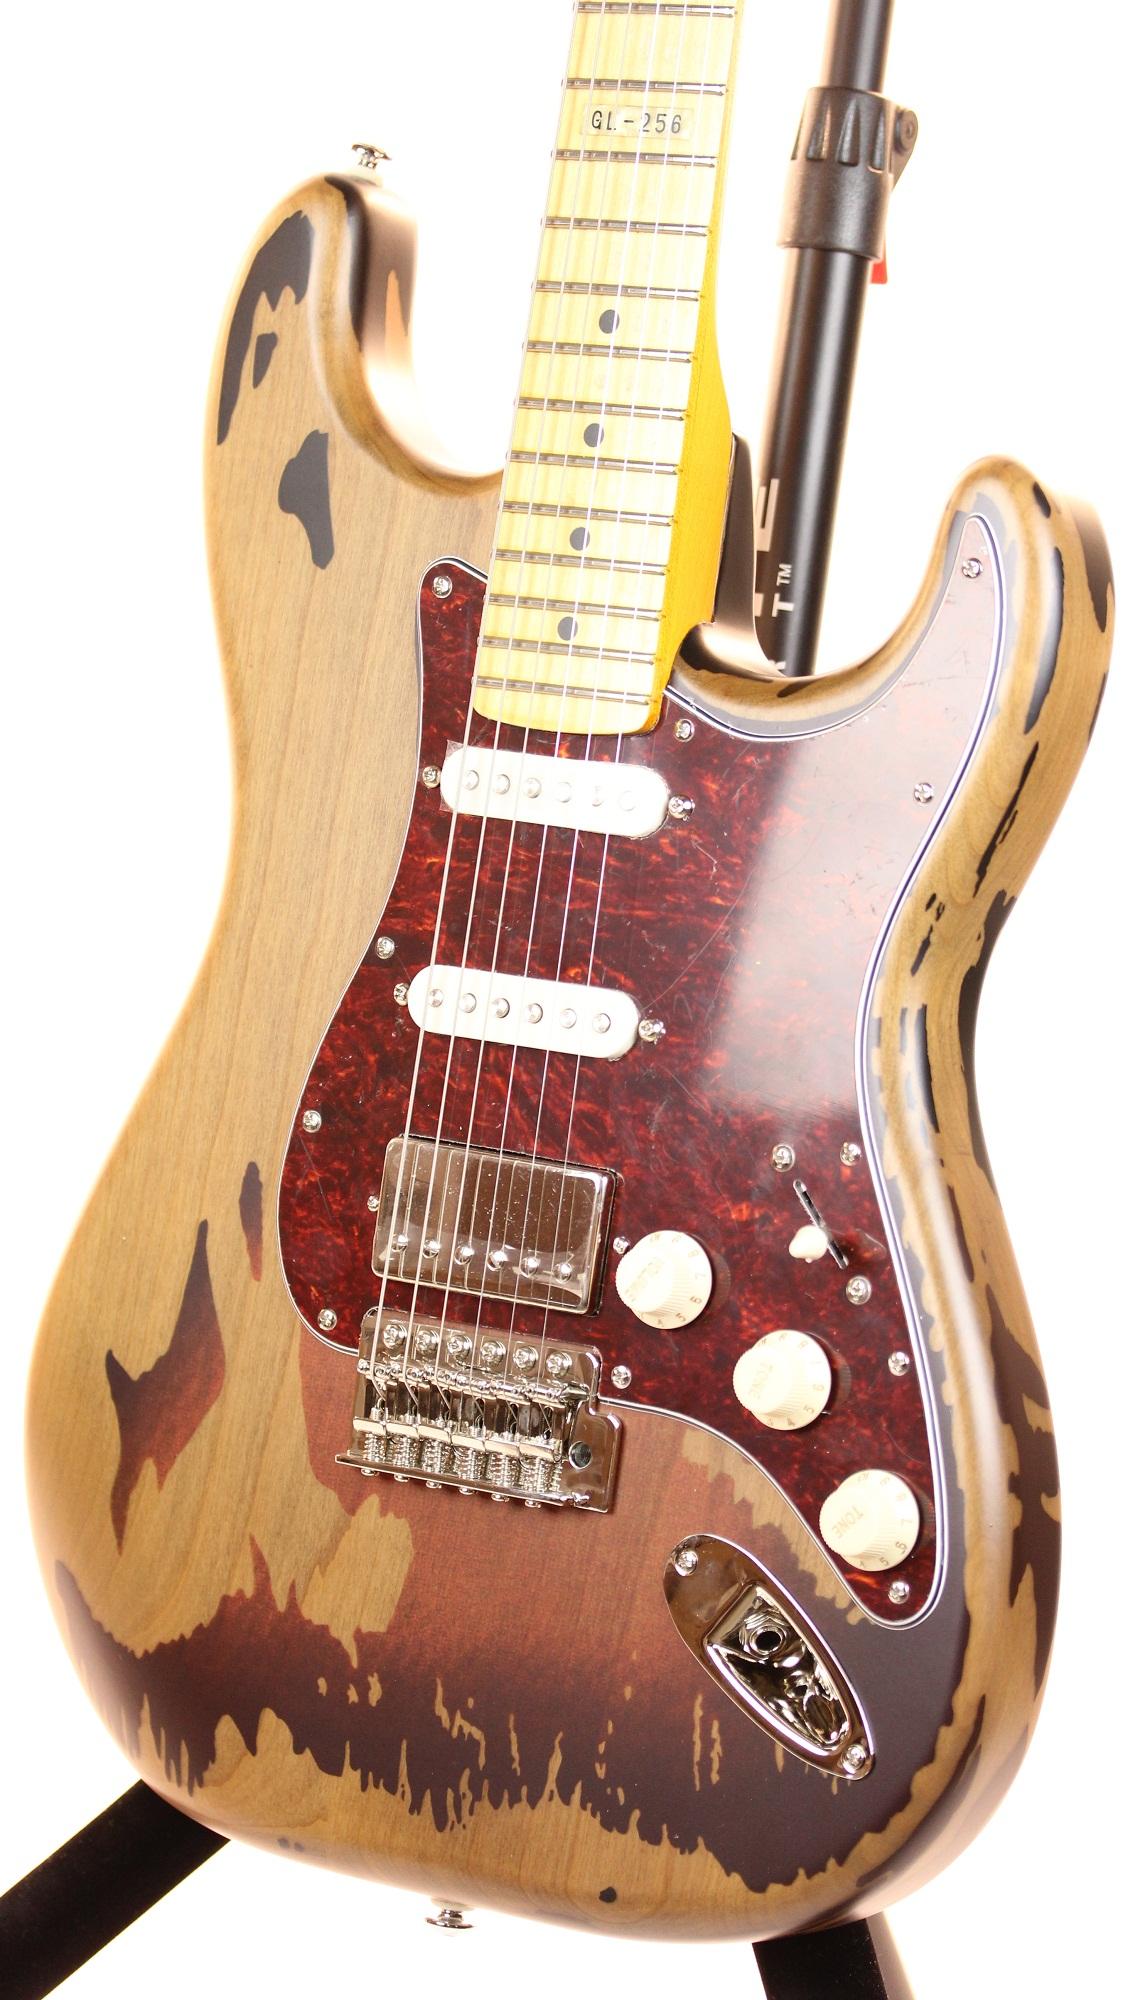 esp ltd george gl 256 george lynch electric guitar 6. Black Bedroom Furniture Sets. Home Design Ideas